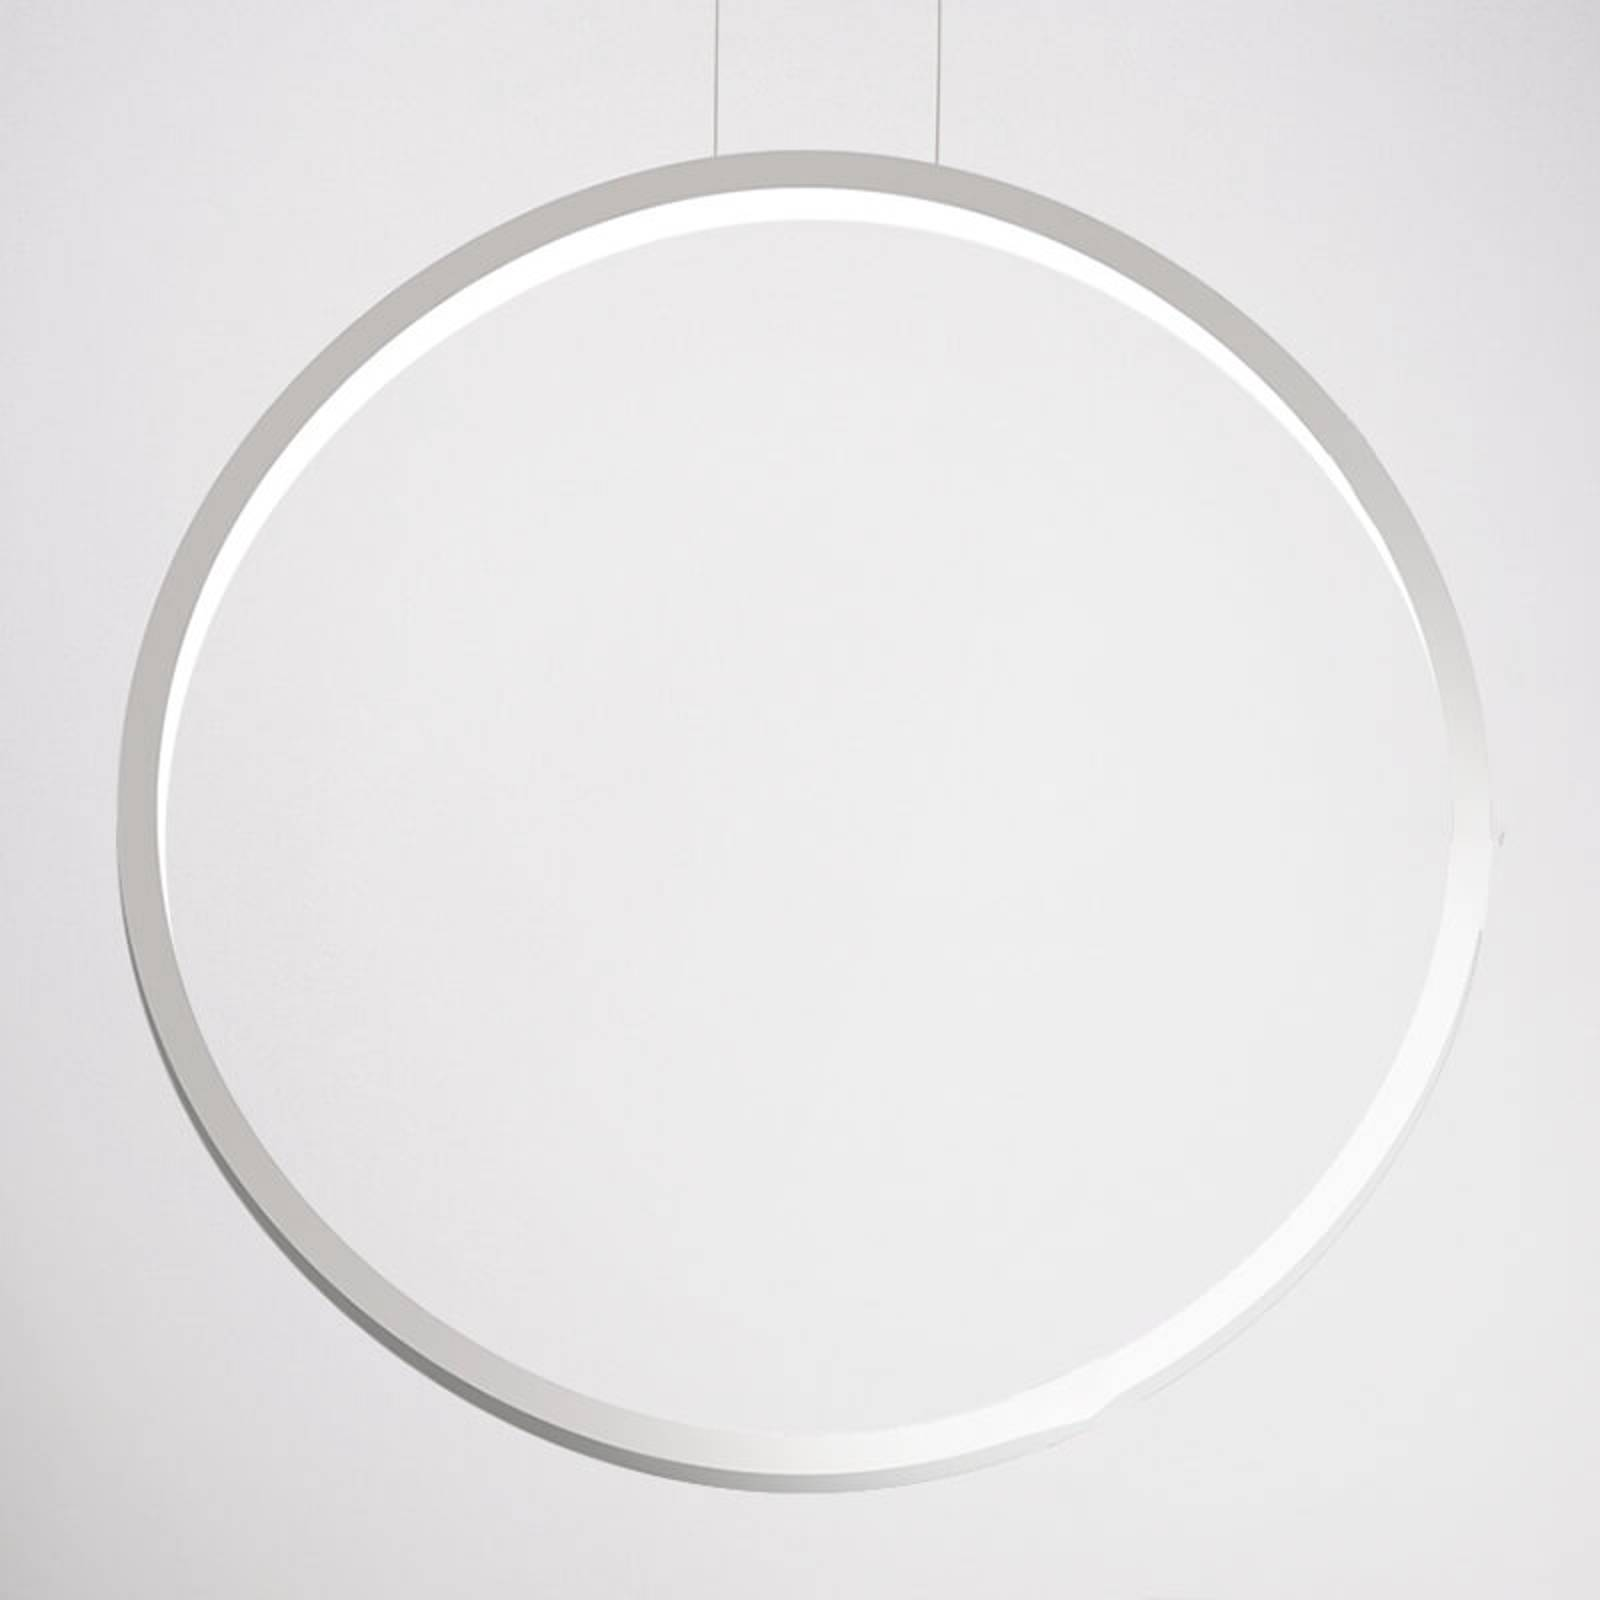 Designerska lampa wisząca LED Assolo, 70 cm